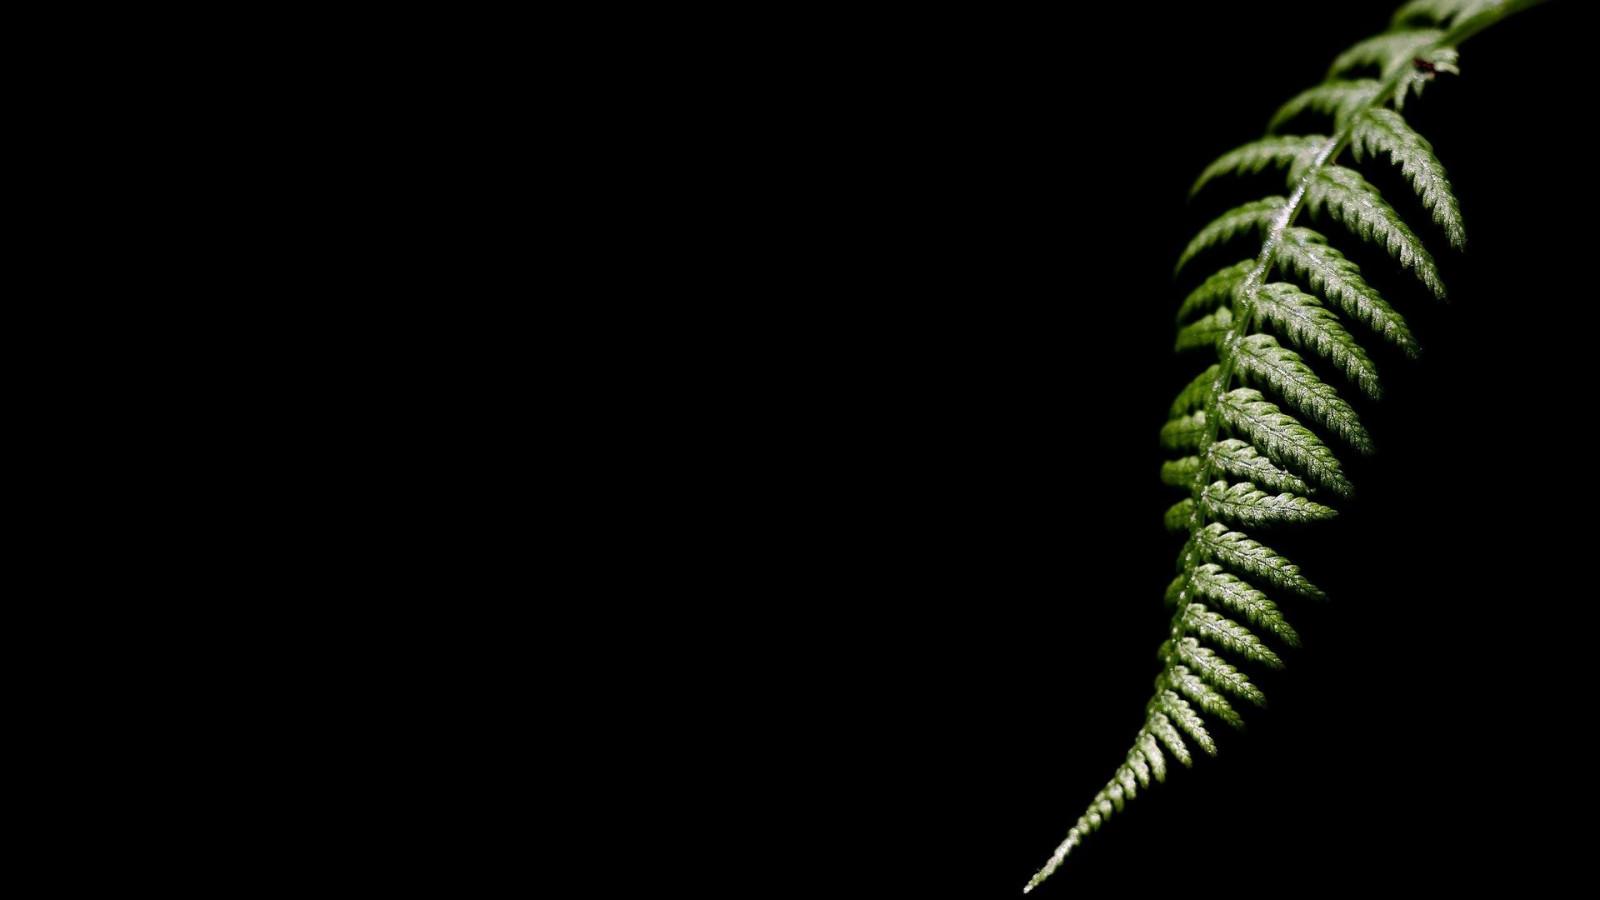 Wallpaper : 1920x1080 px, black background, ferns, green ...